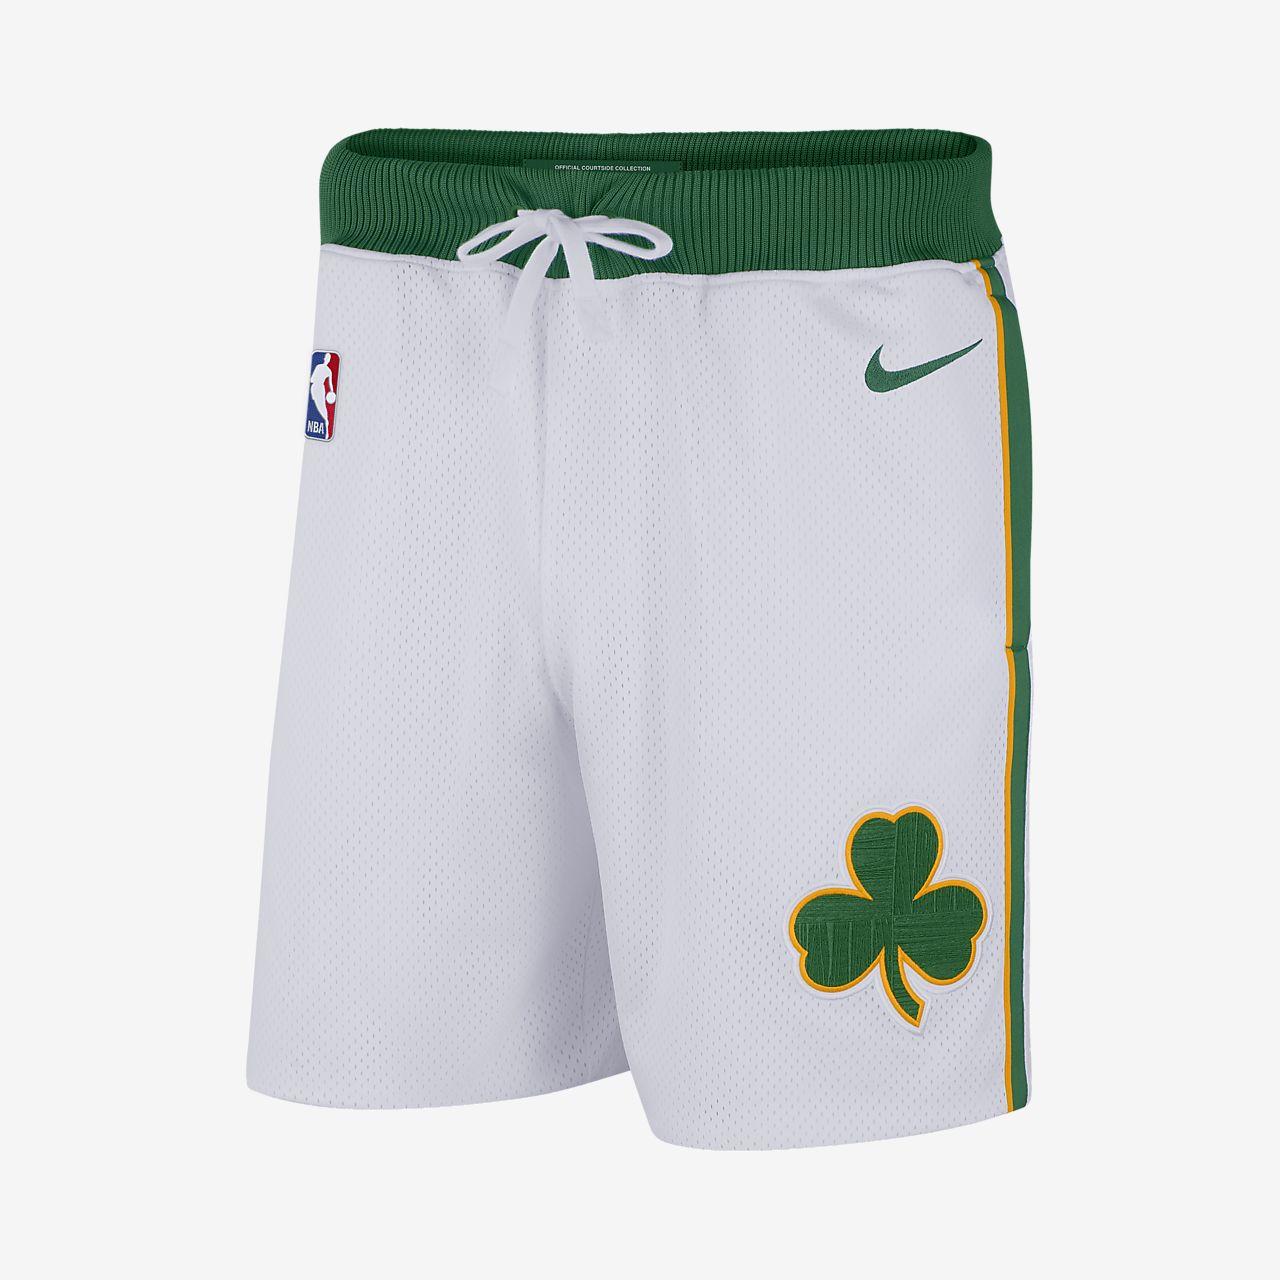 Boston Celtics Nike Courtside NBA-shorts til mænd